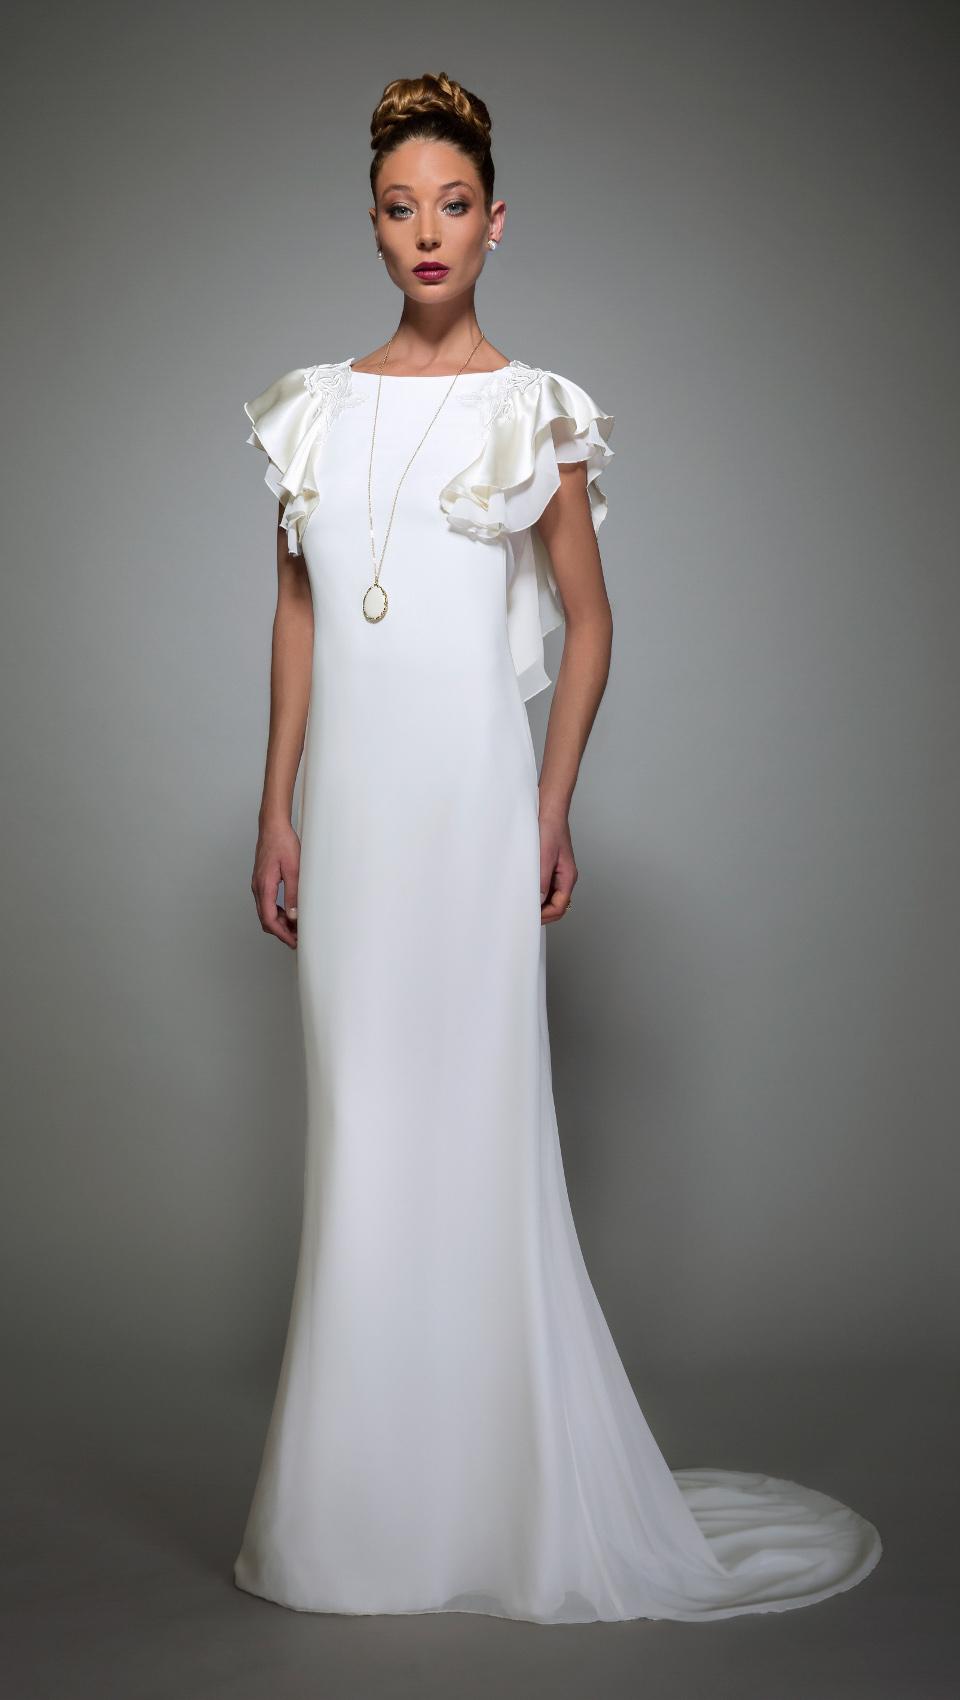 Daring Yet Feminine Wedding Dress Collection By Makany Marta foto